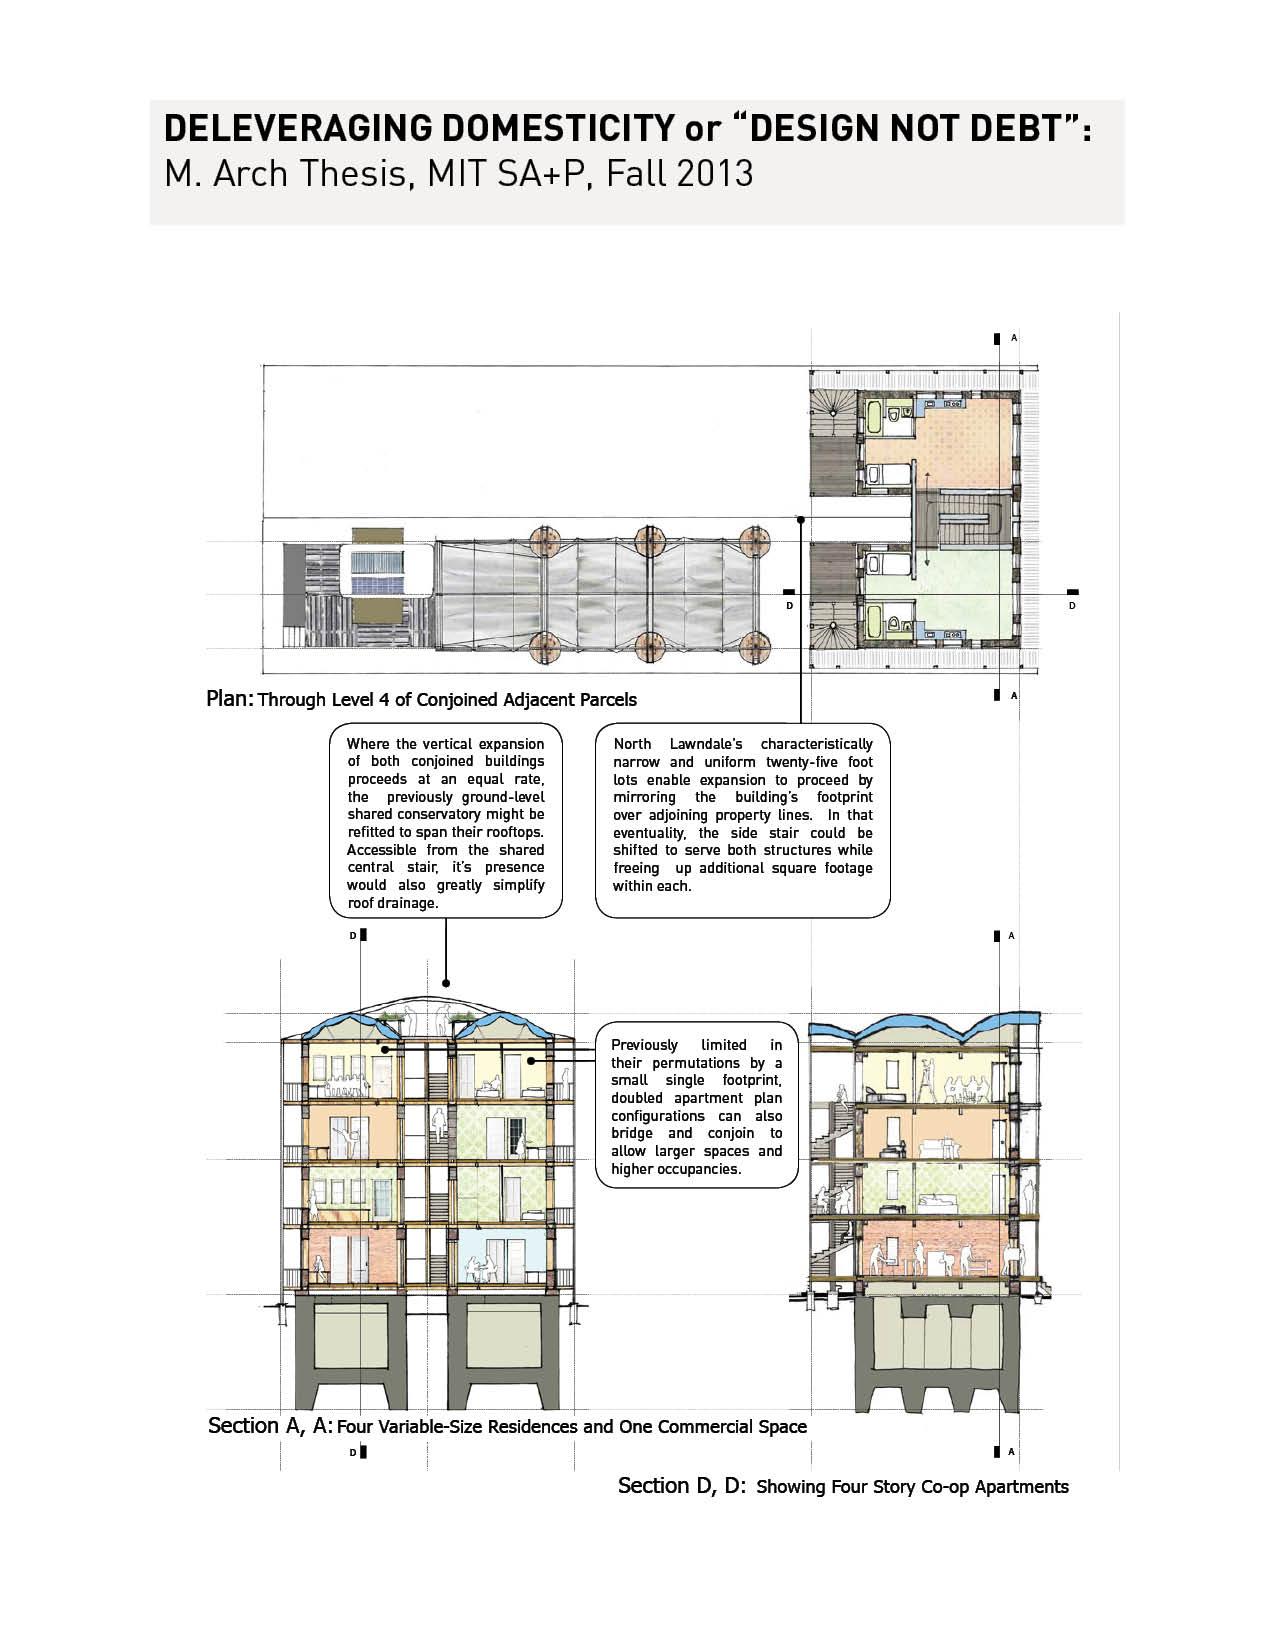 MIT_thesis13.jpg